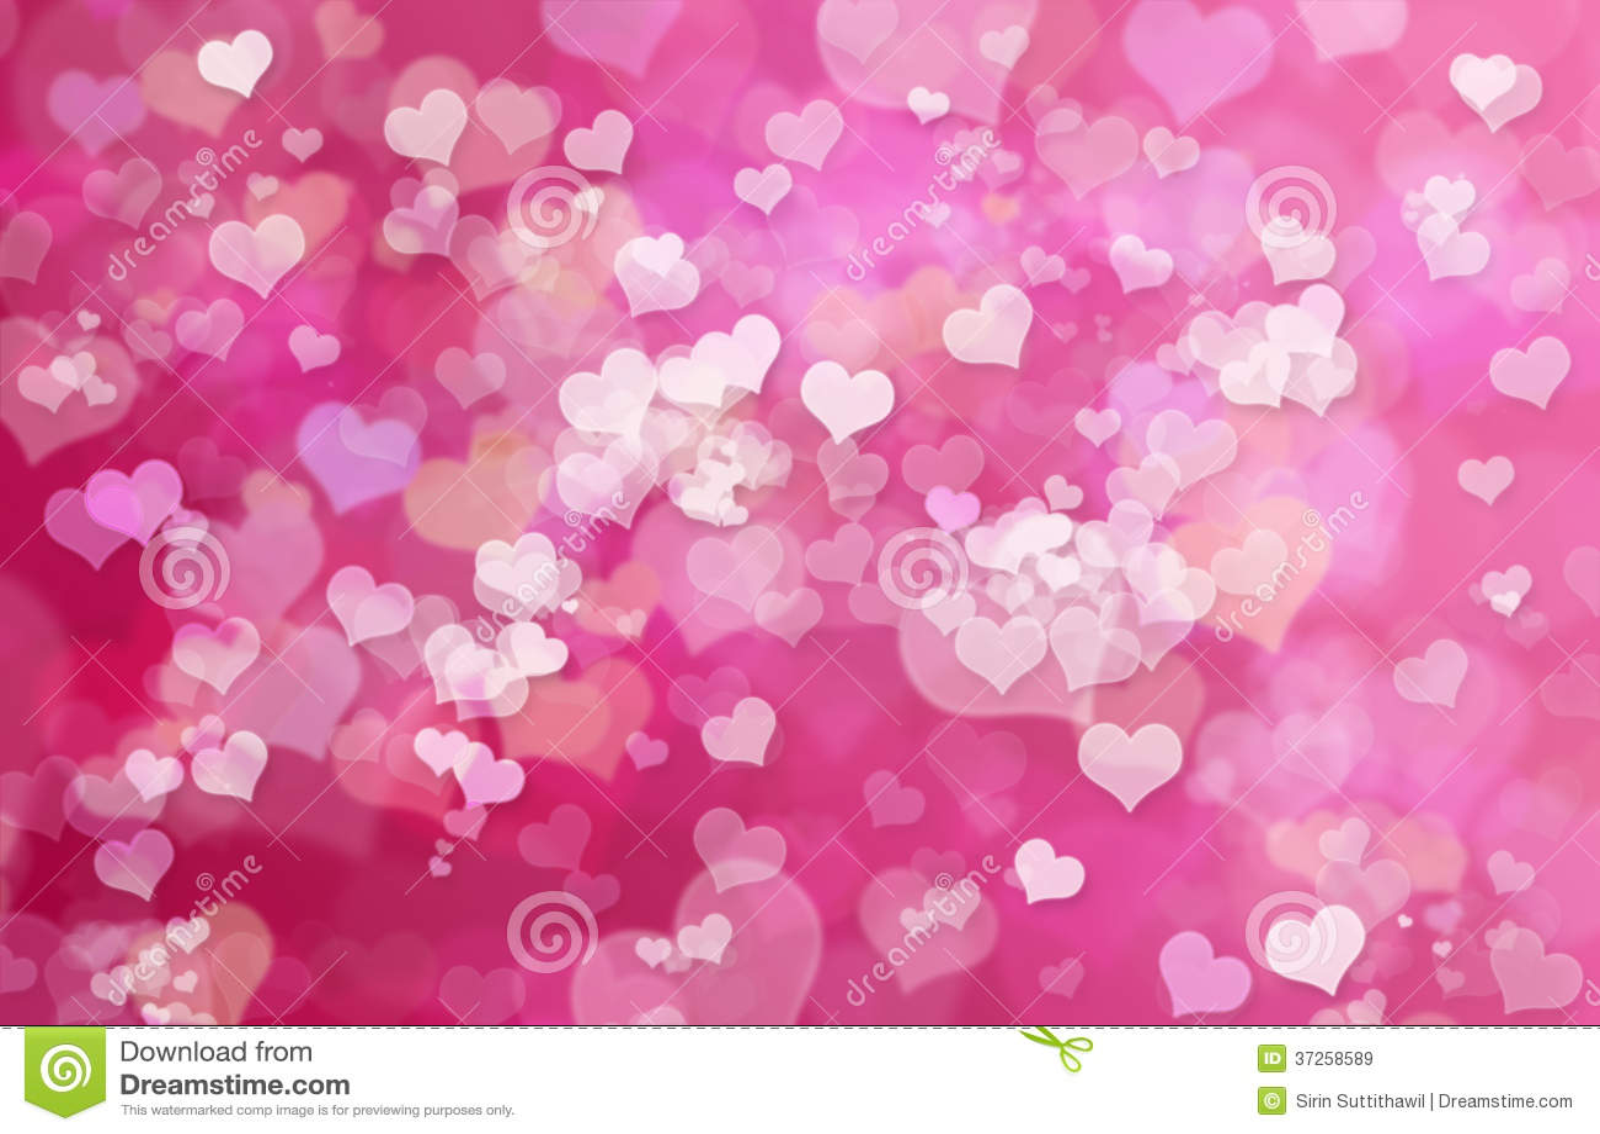 Предпосылка пинка конспекта сердец валентинки: Обои дня валентинки